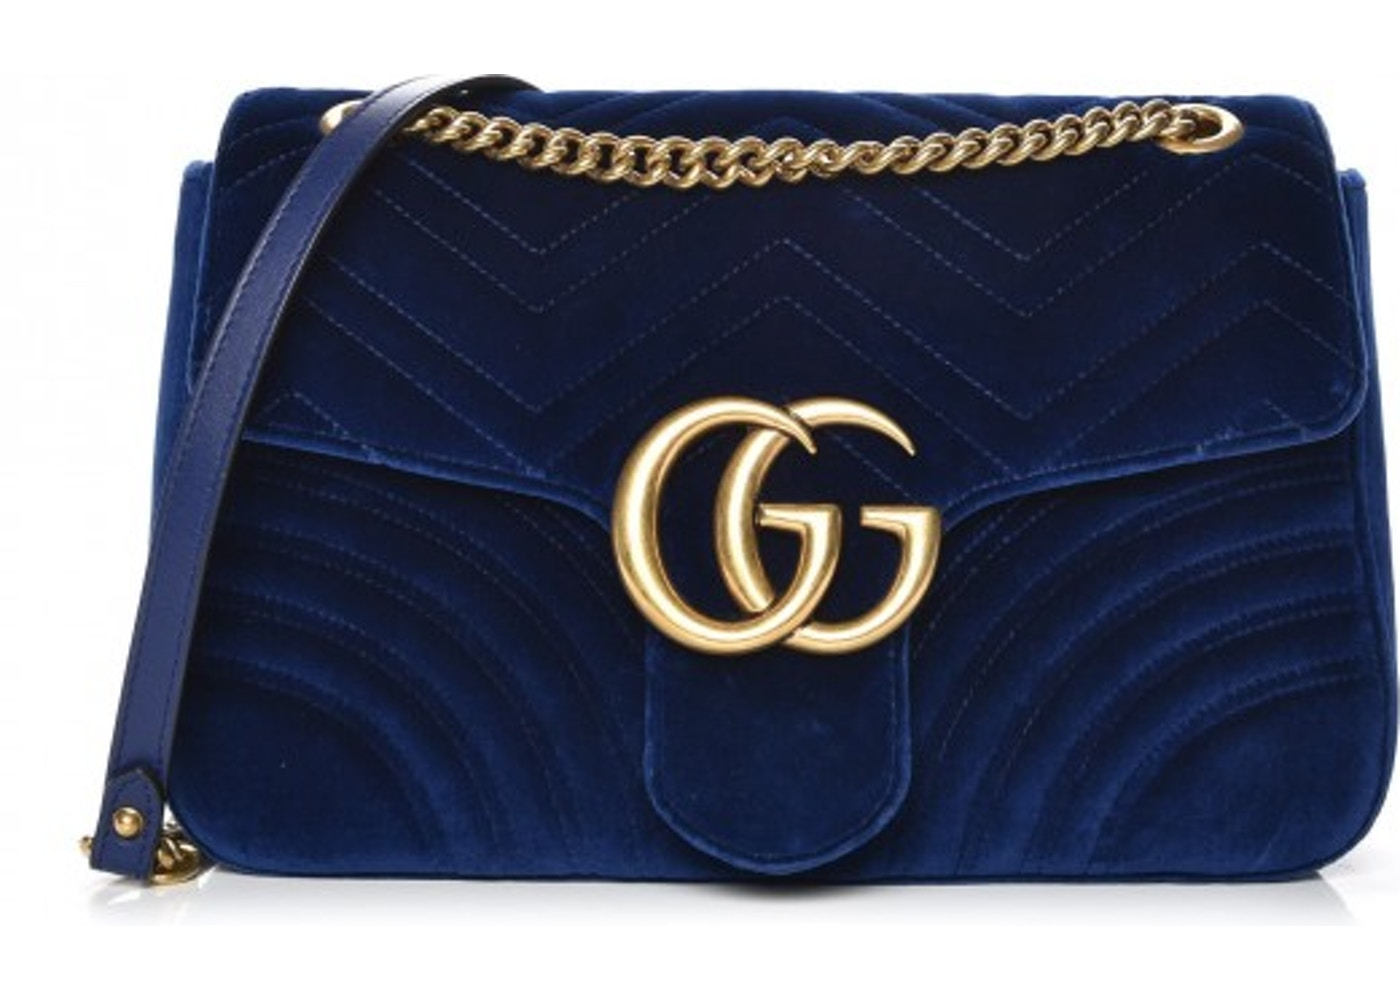 e7390067f3b9d1 Gucci Marmont Crossbody Matelasse GG Medium Cobalt Blue